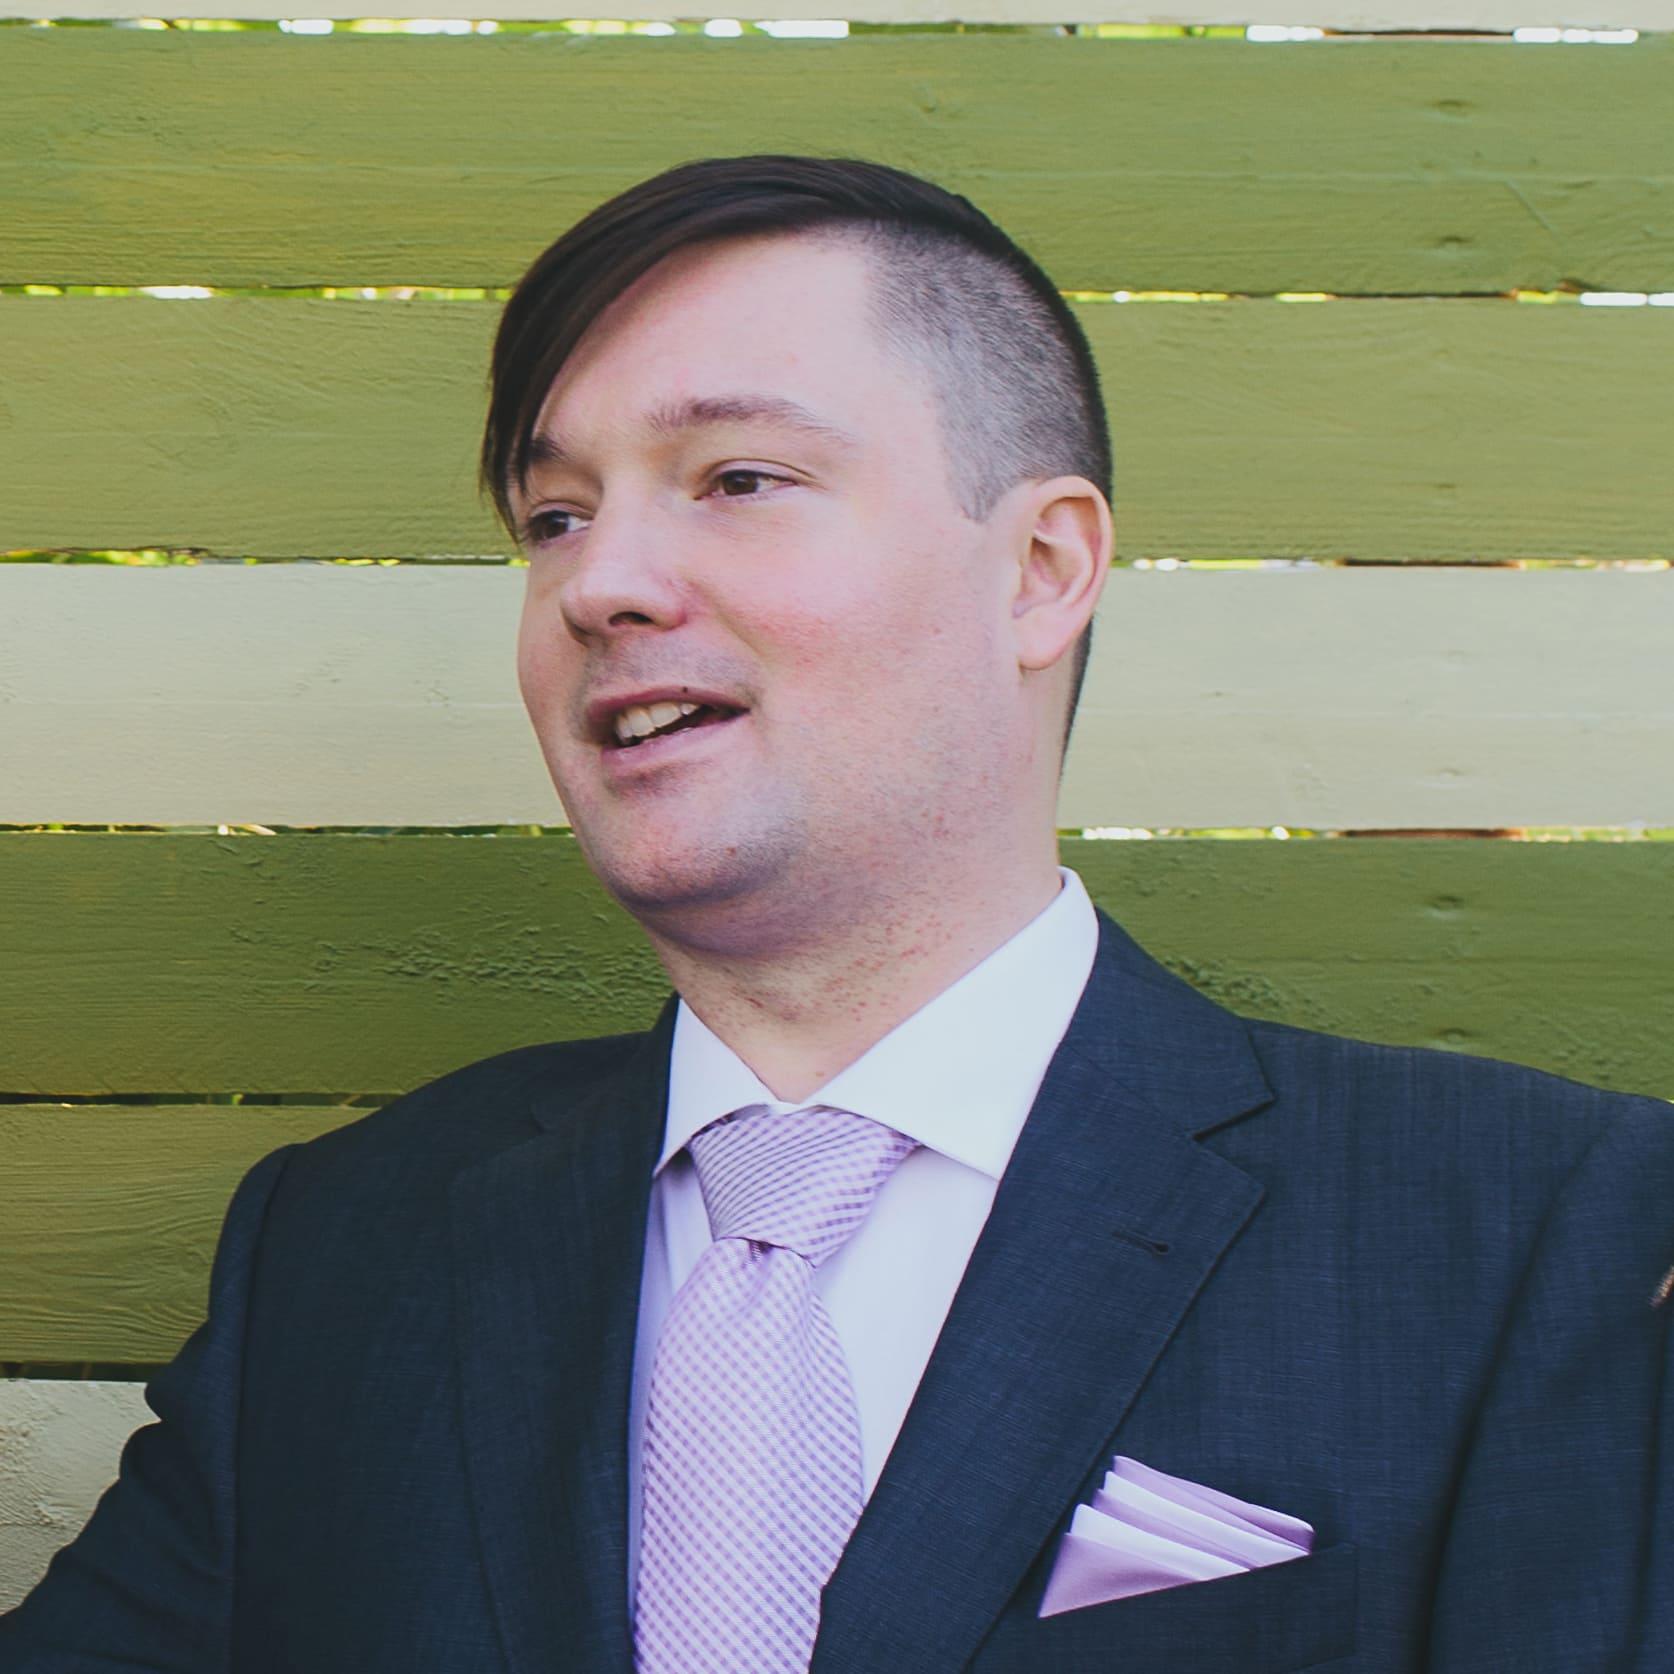 Dennis Tobenski